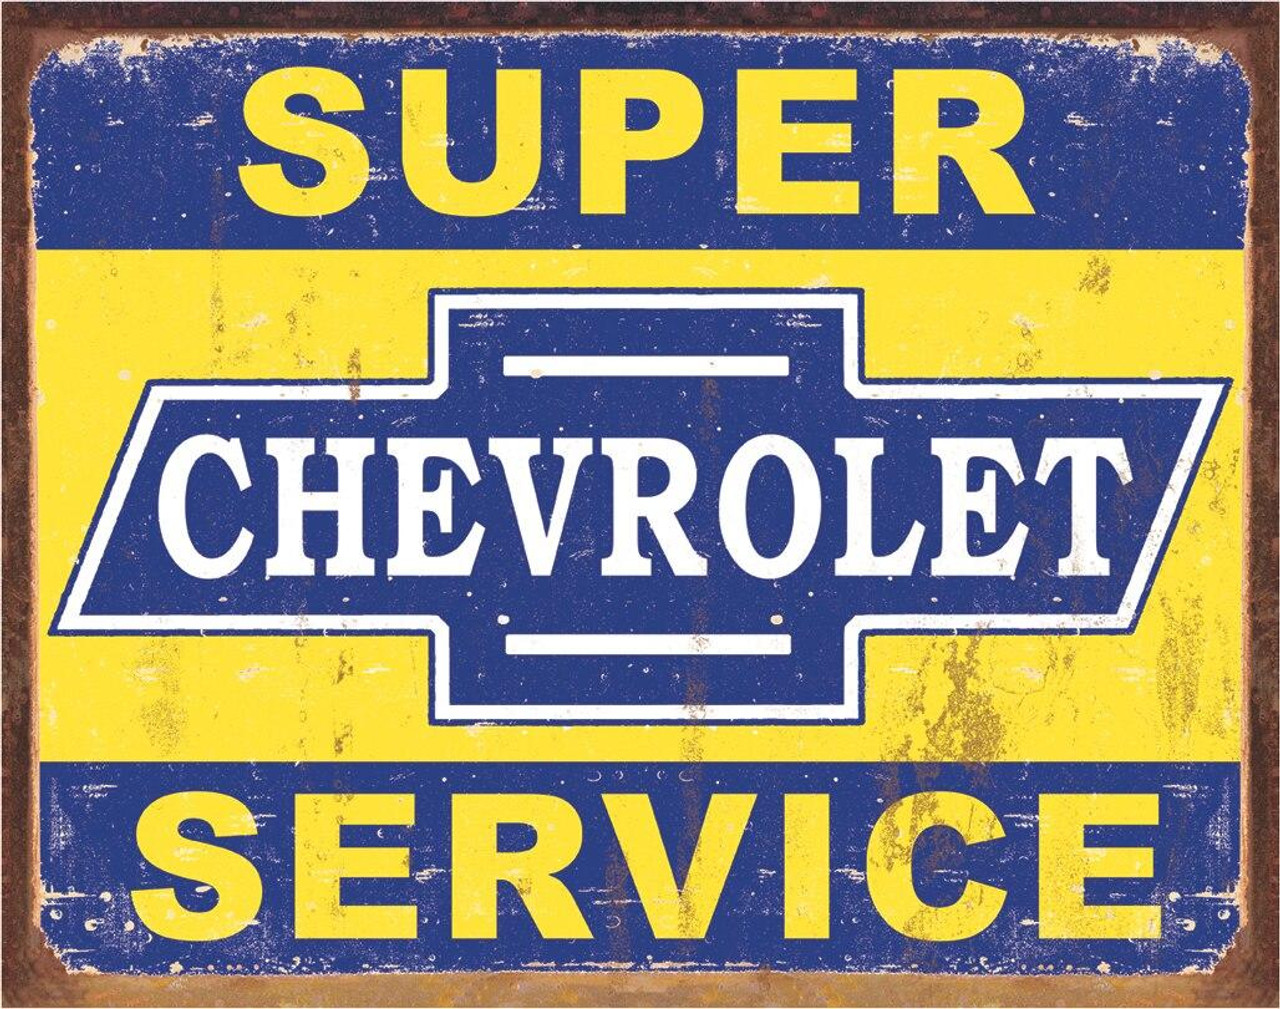 General Motors Super Chevy Service